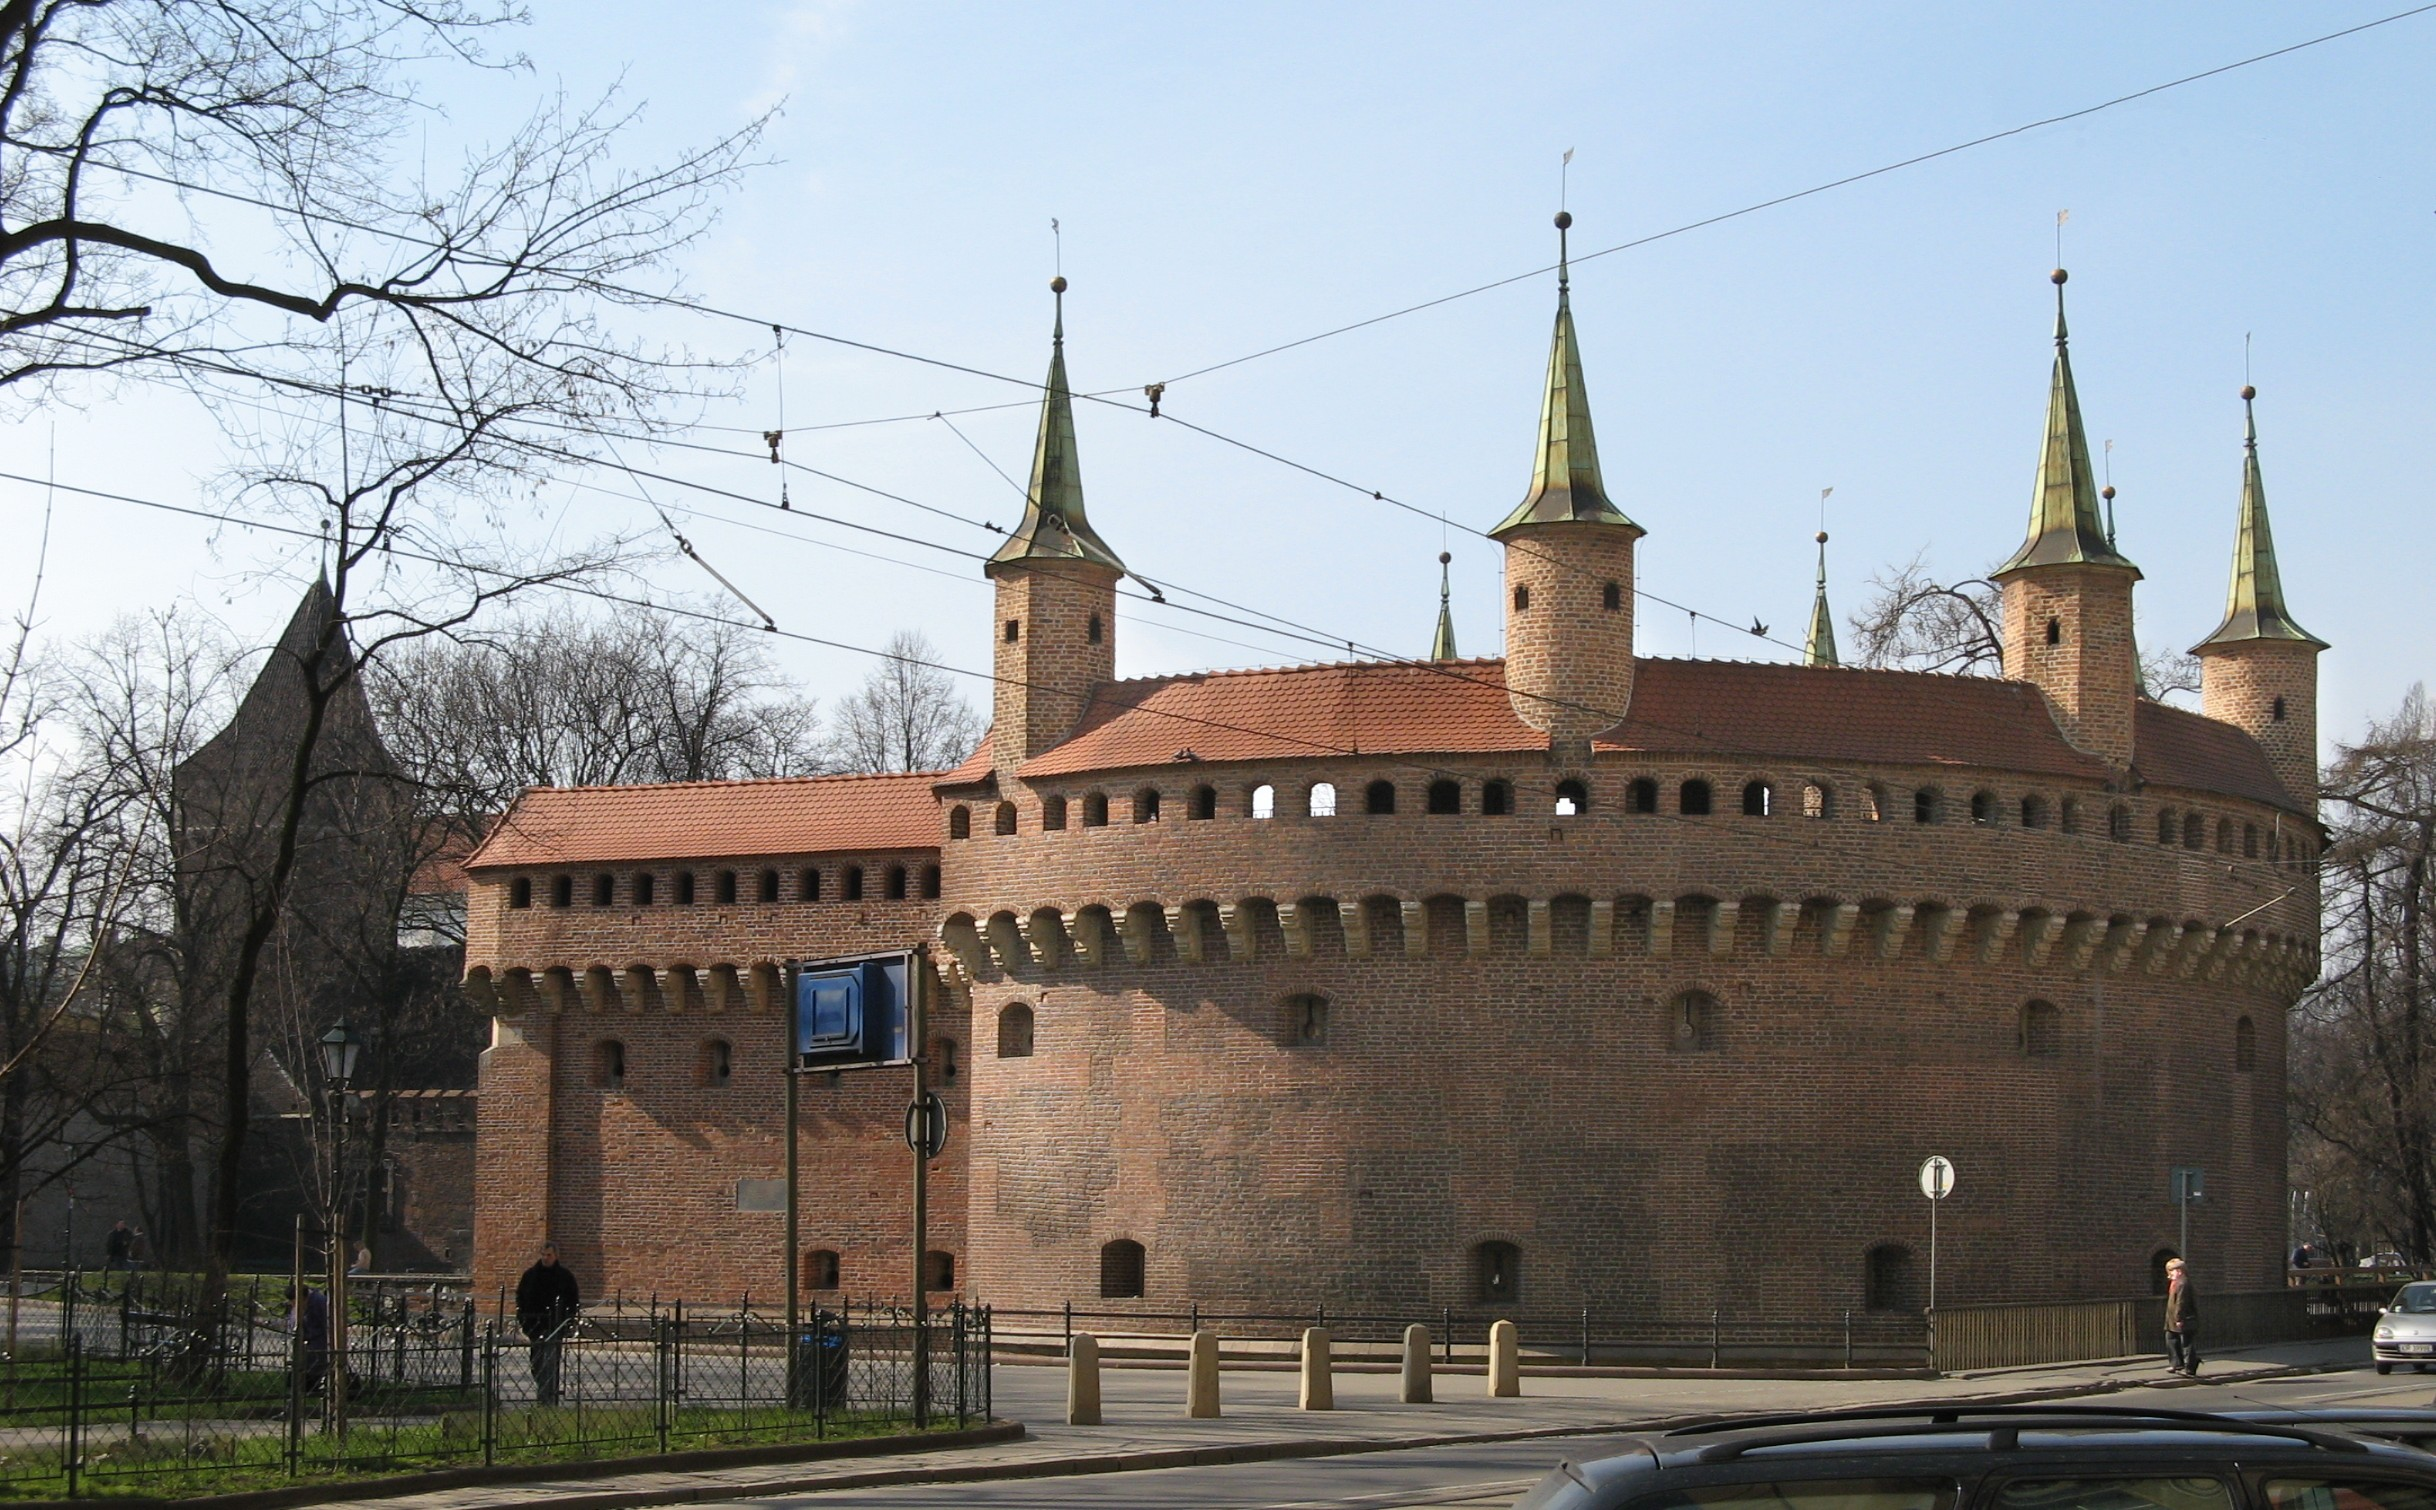 Barbacana de Cracovia - Wikipedia, la enciclopedia libre